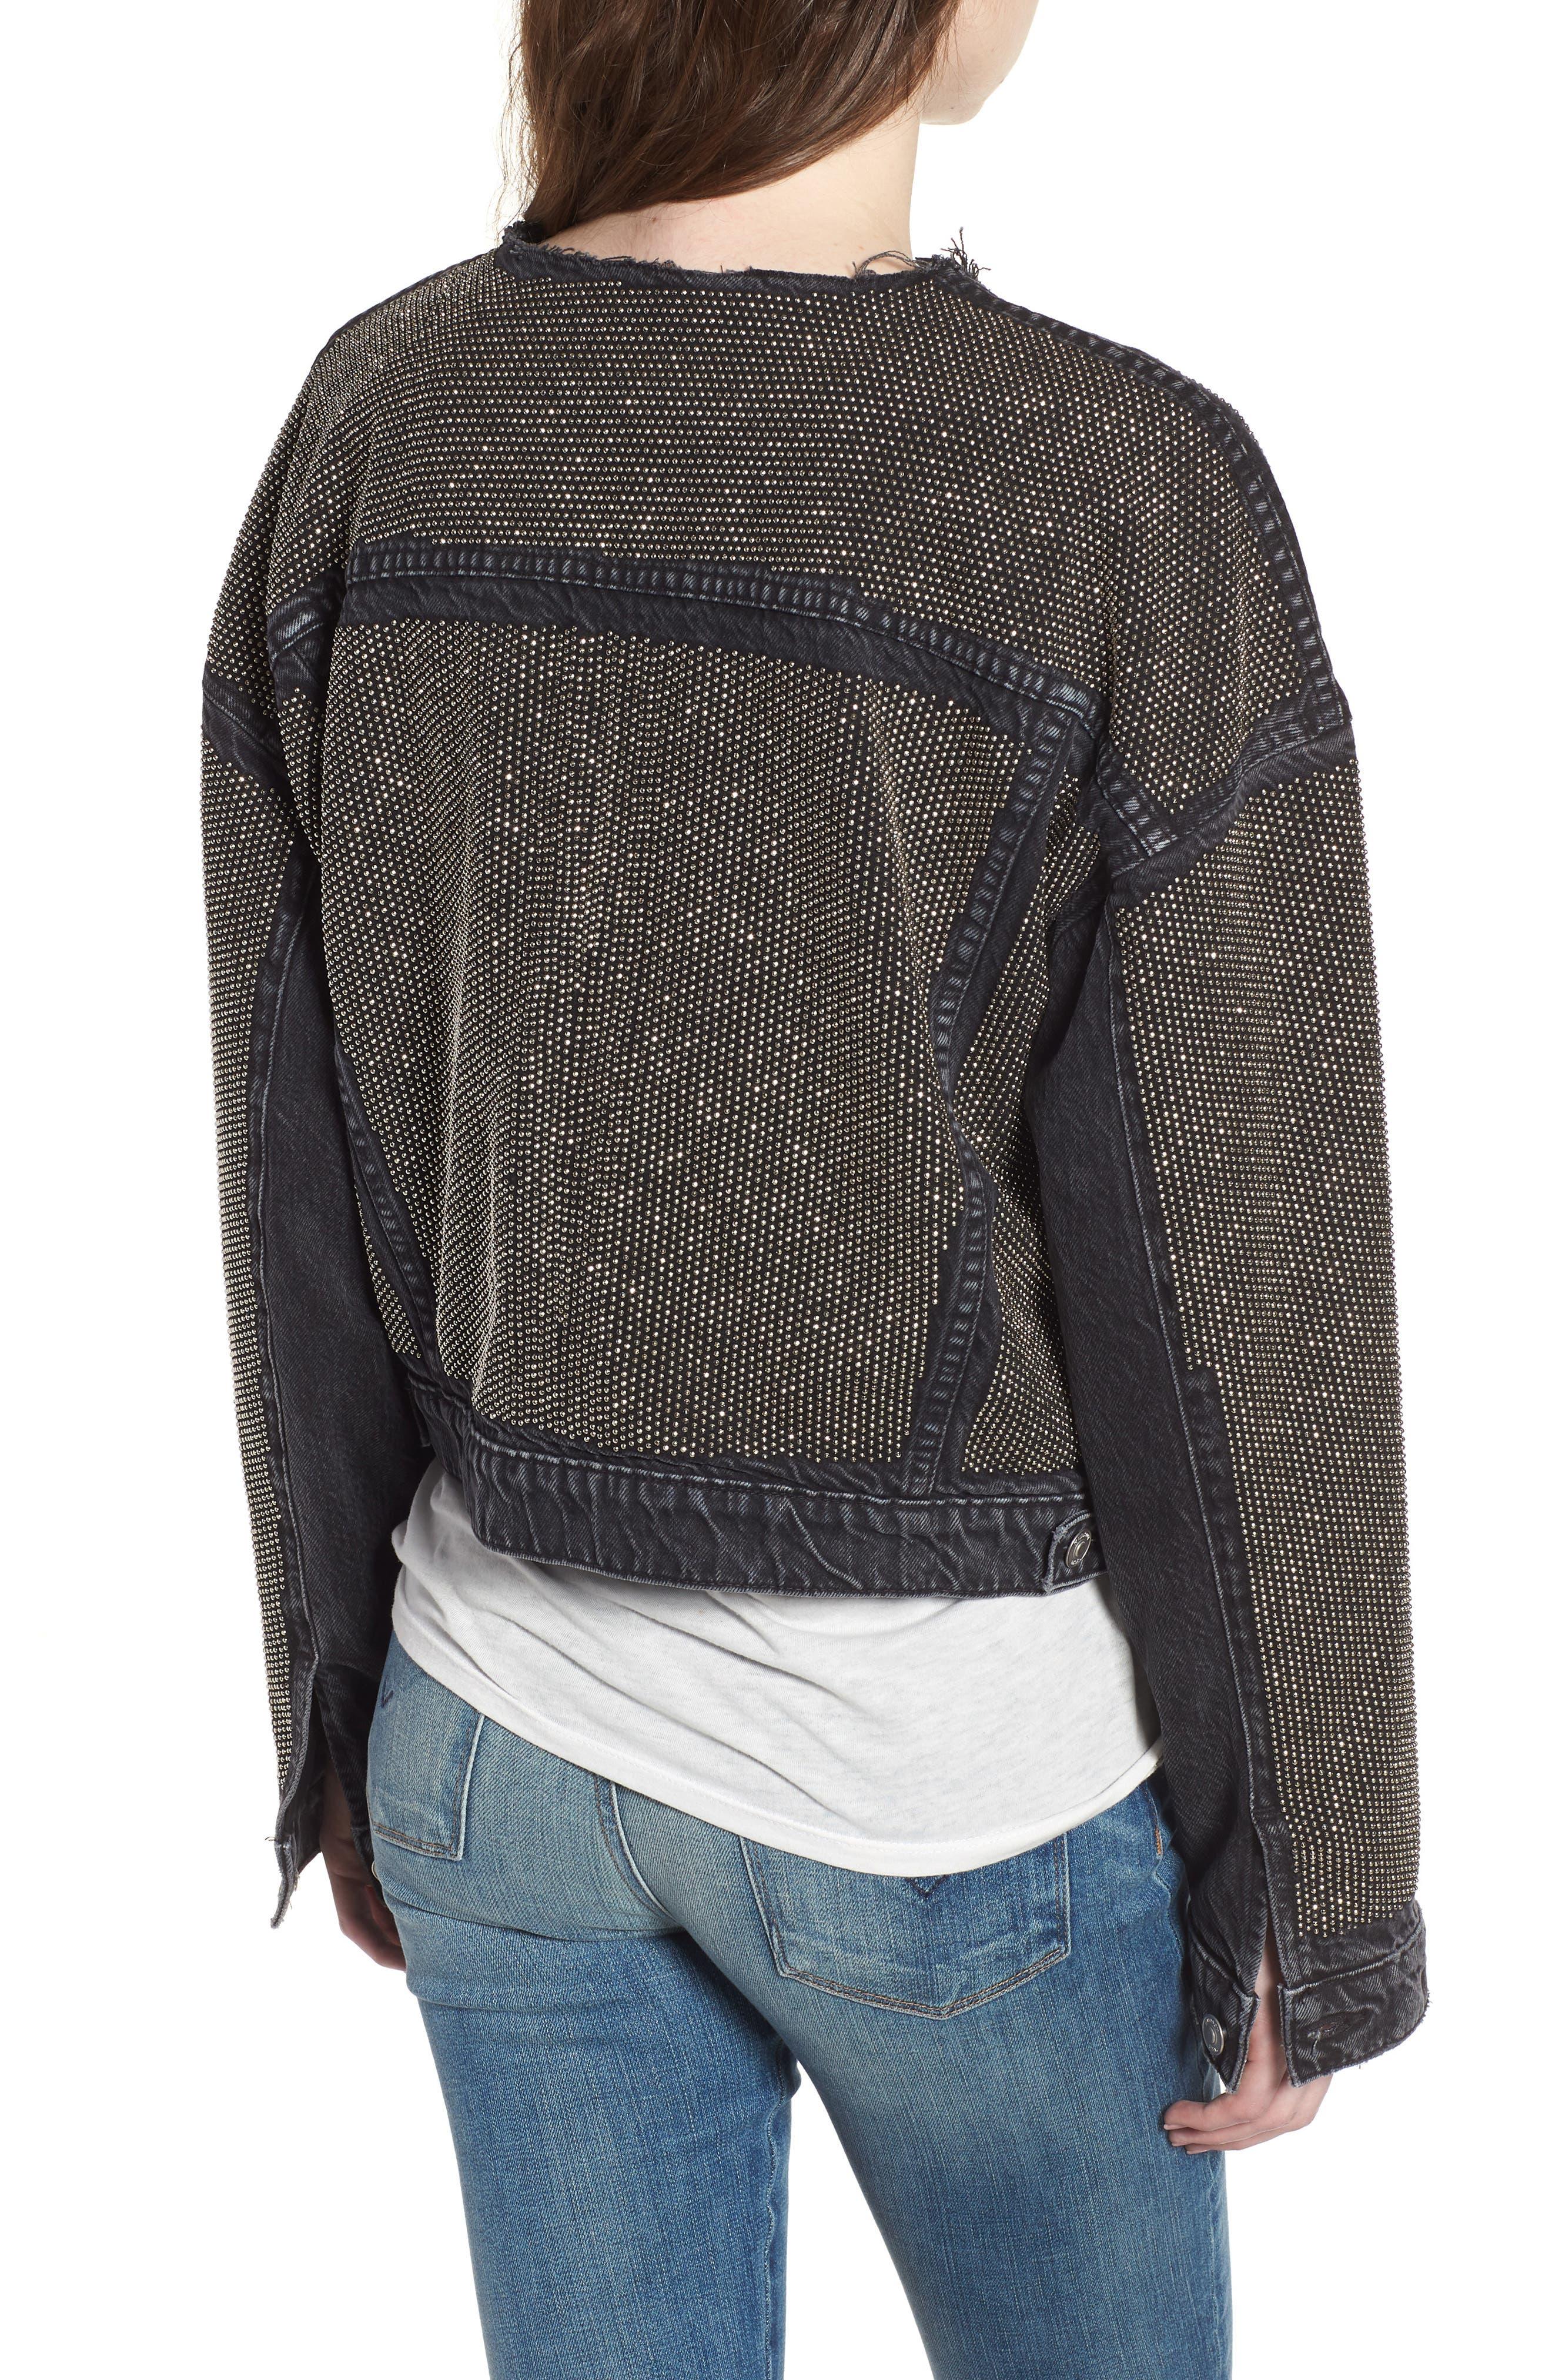 Rei Studded Crop Denim Jacket,                             Alternate thumbnail 2, color,                             Bullet Proof